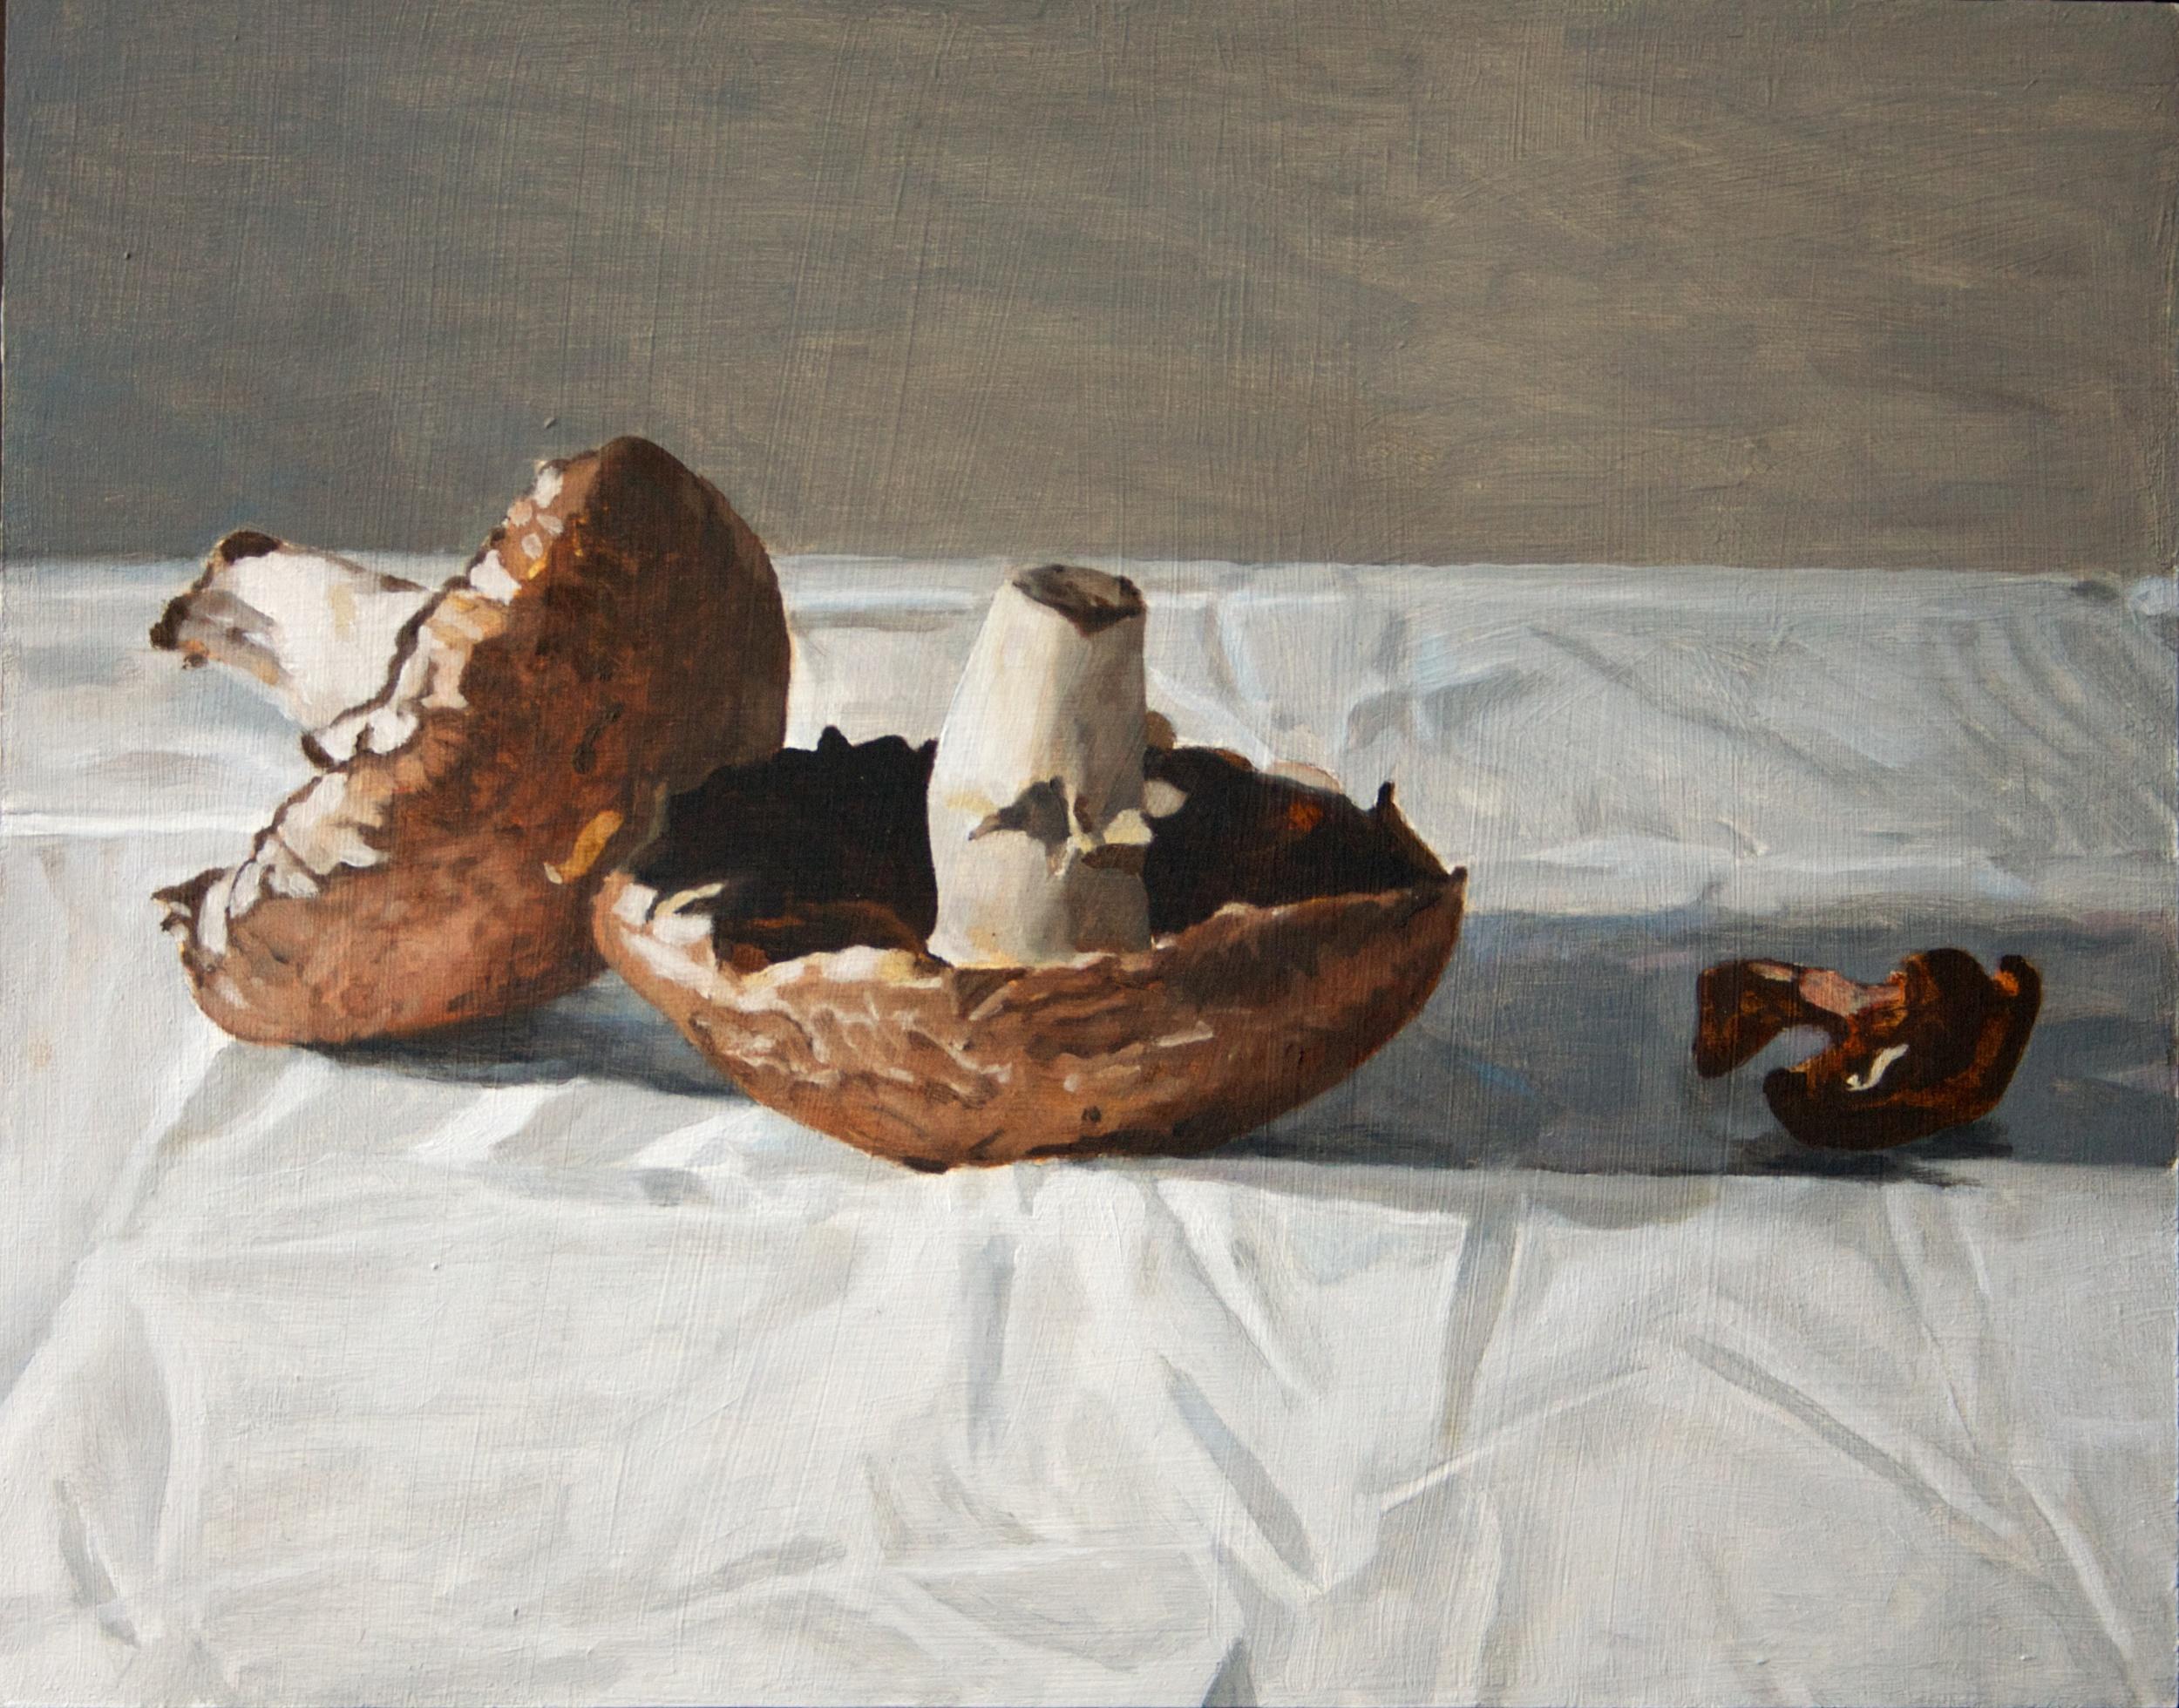 Still Life, Portobello and Shitaki Mushrooms, 2012 Oil on panel, 11 x 14 inches $725 + HST. Custom milled revealframe, painted white balsam